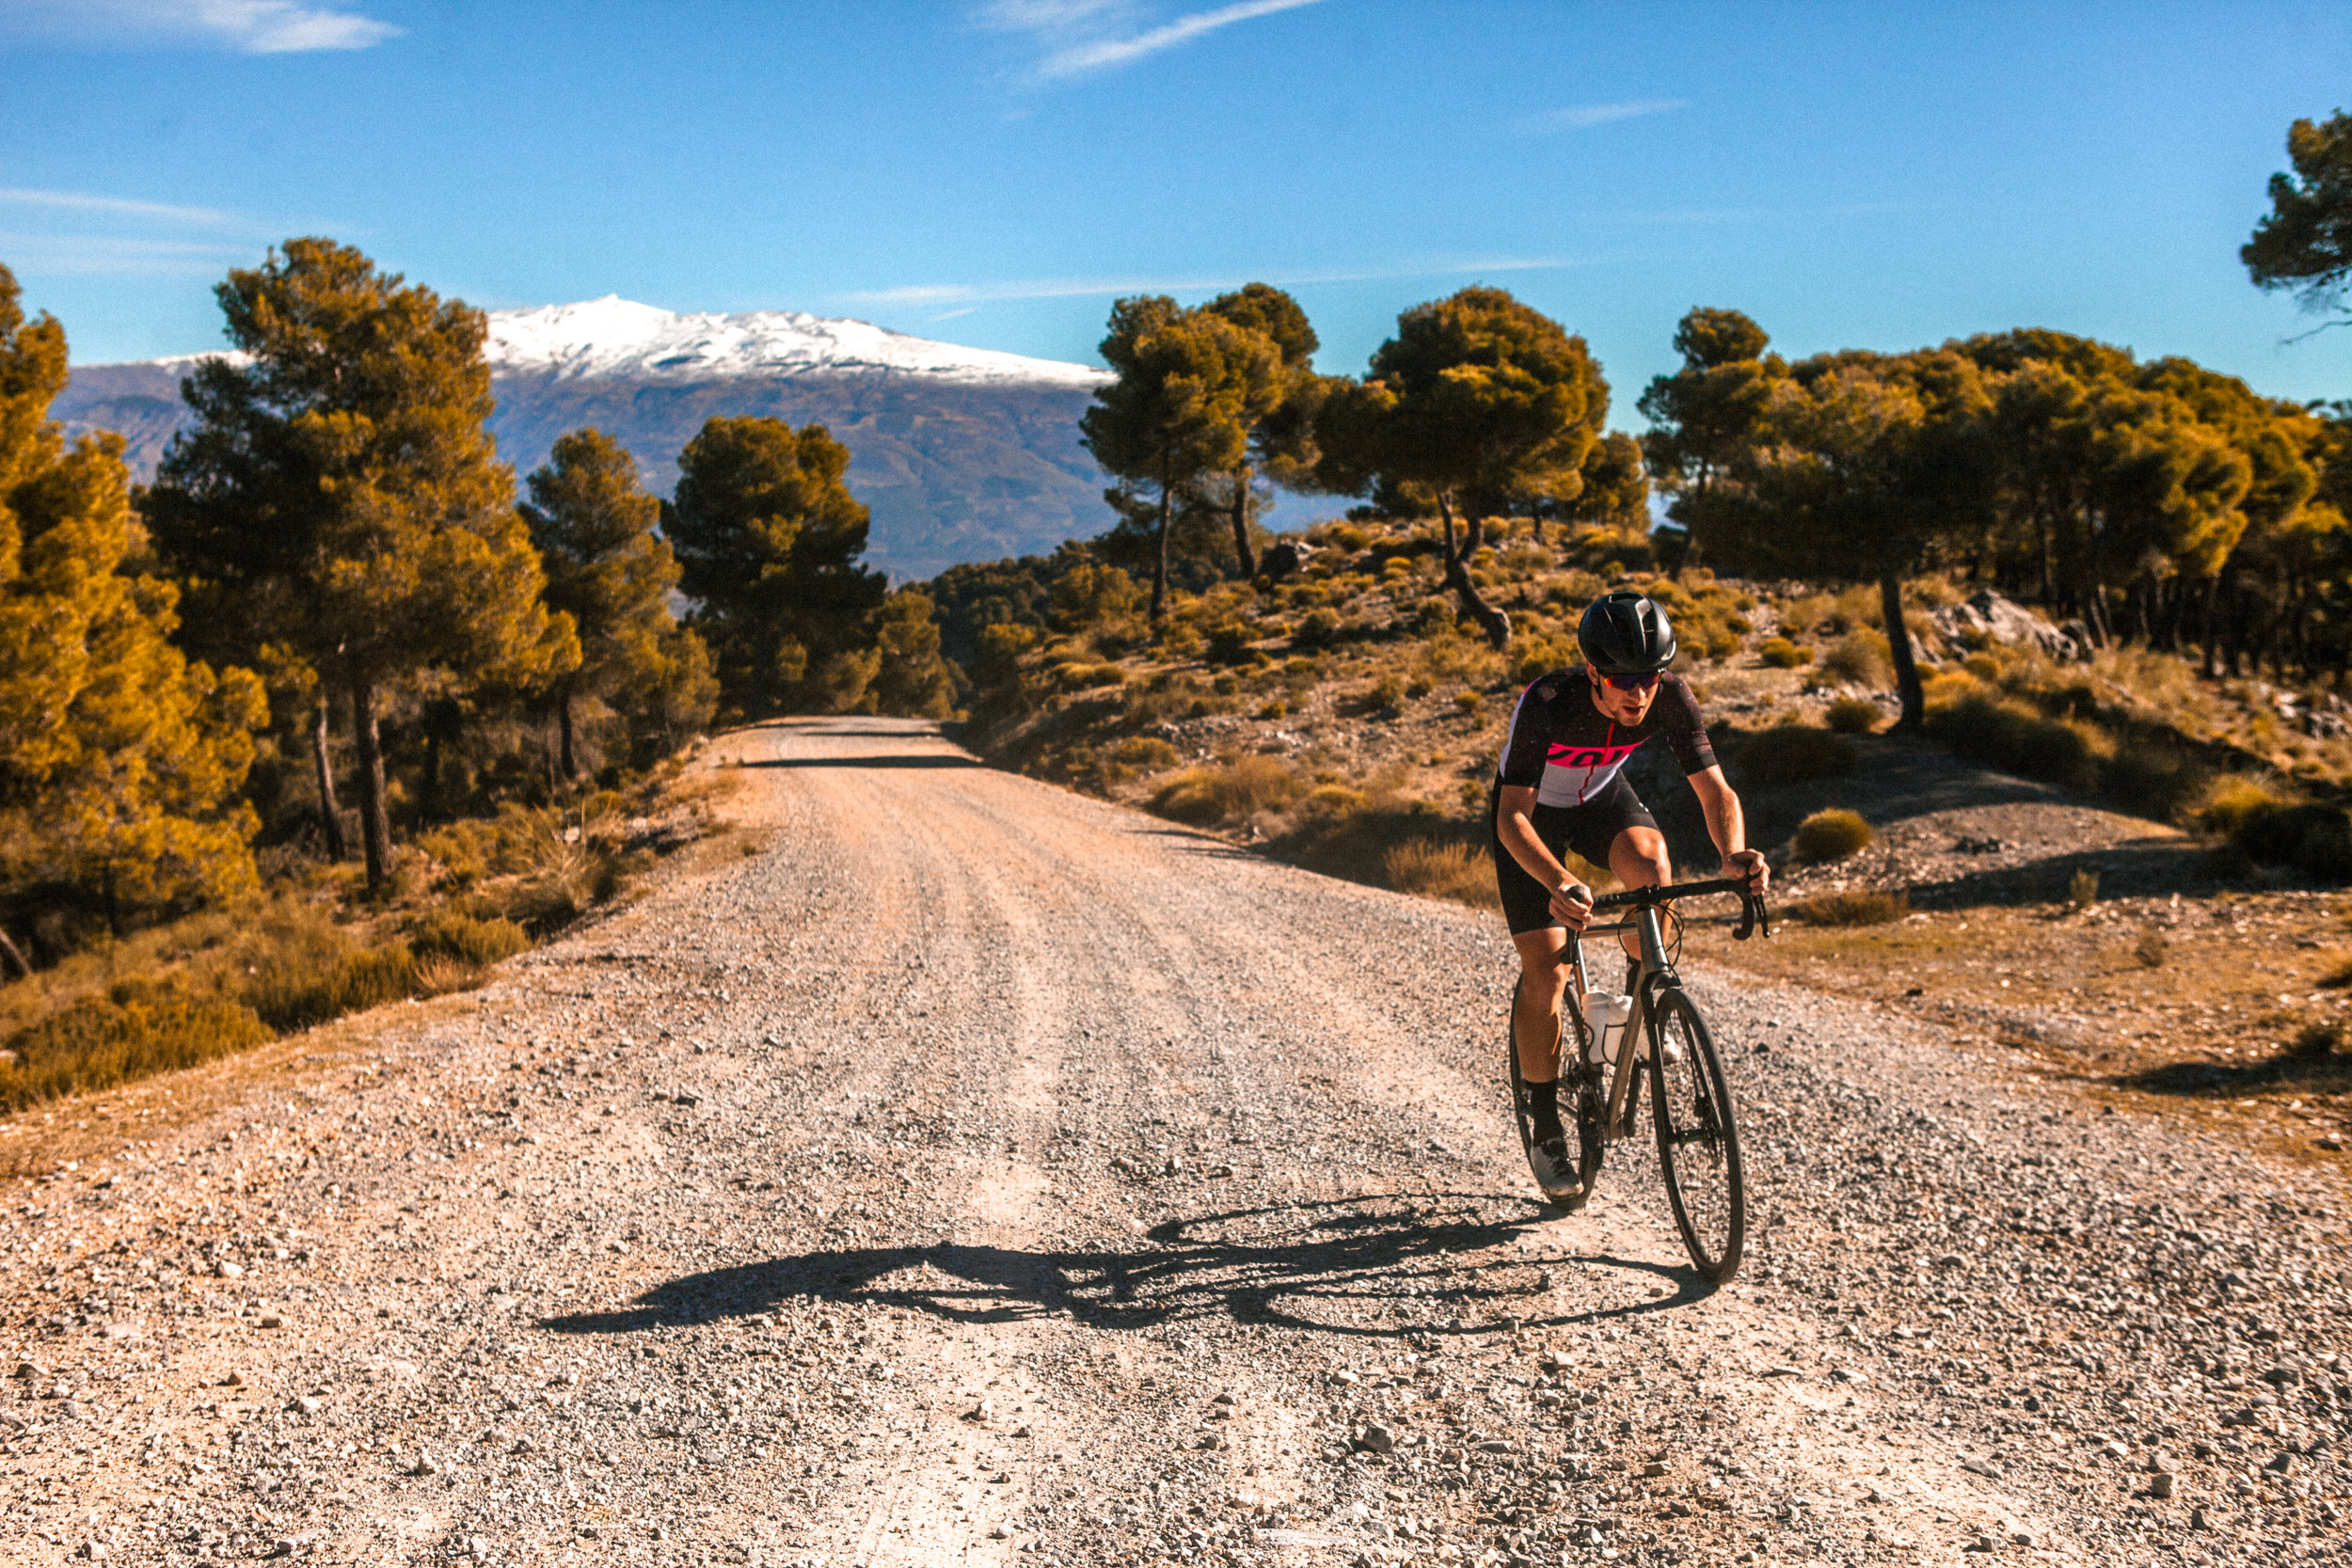 gravel_cycling_holidays_spain.jpg